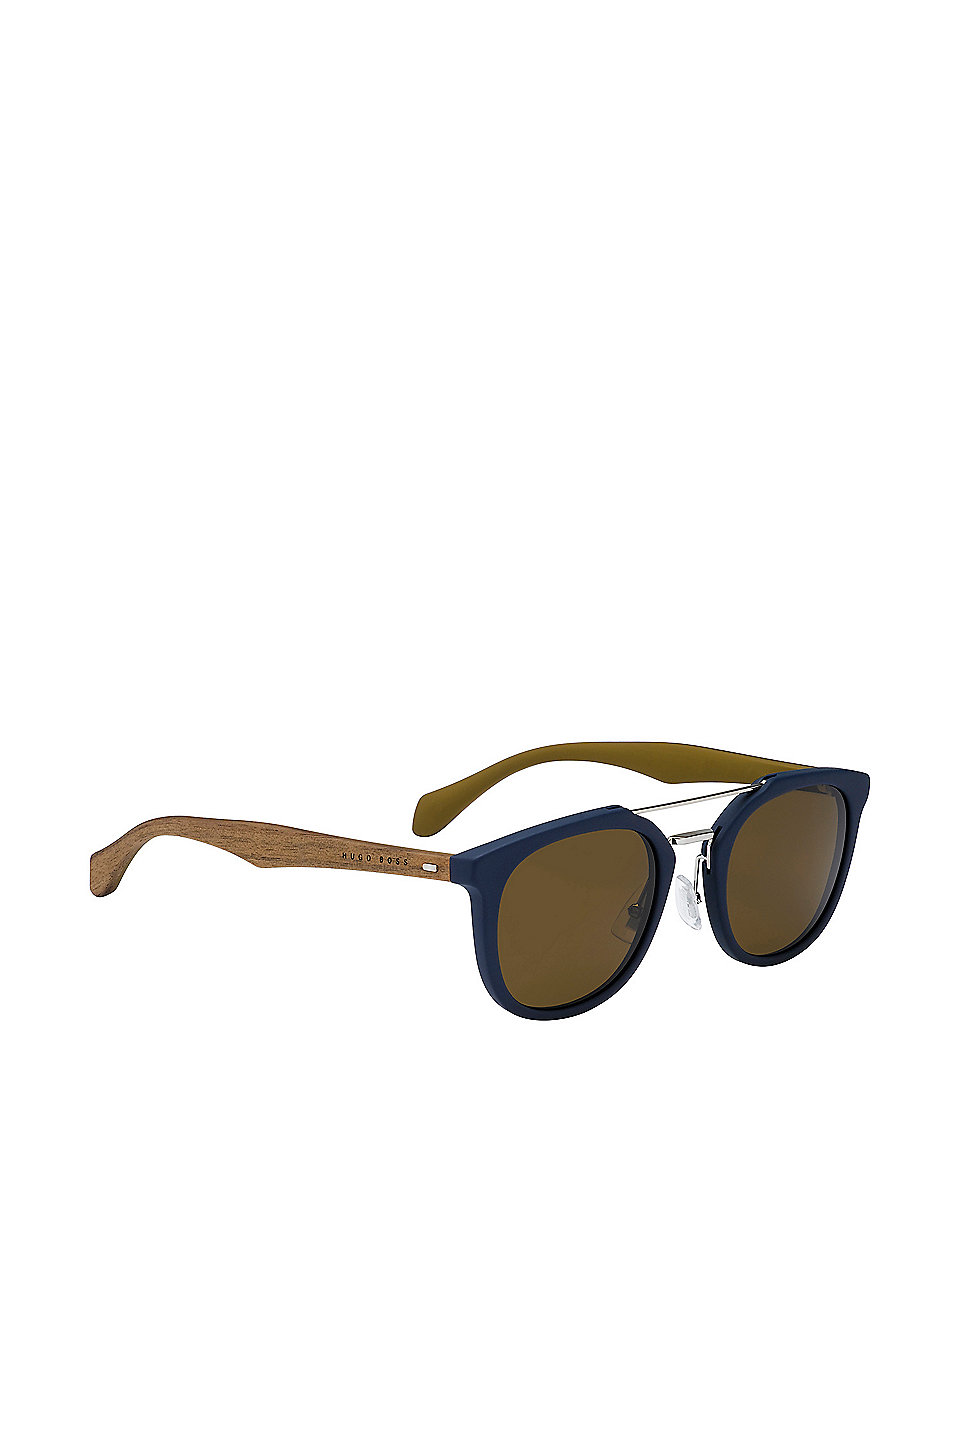 Clubmaster Fake Glasses 2017